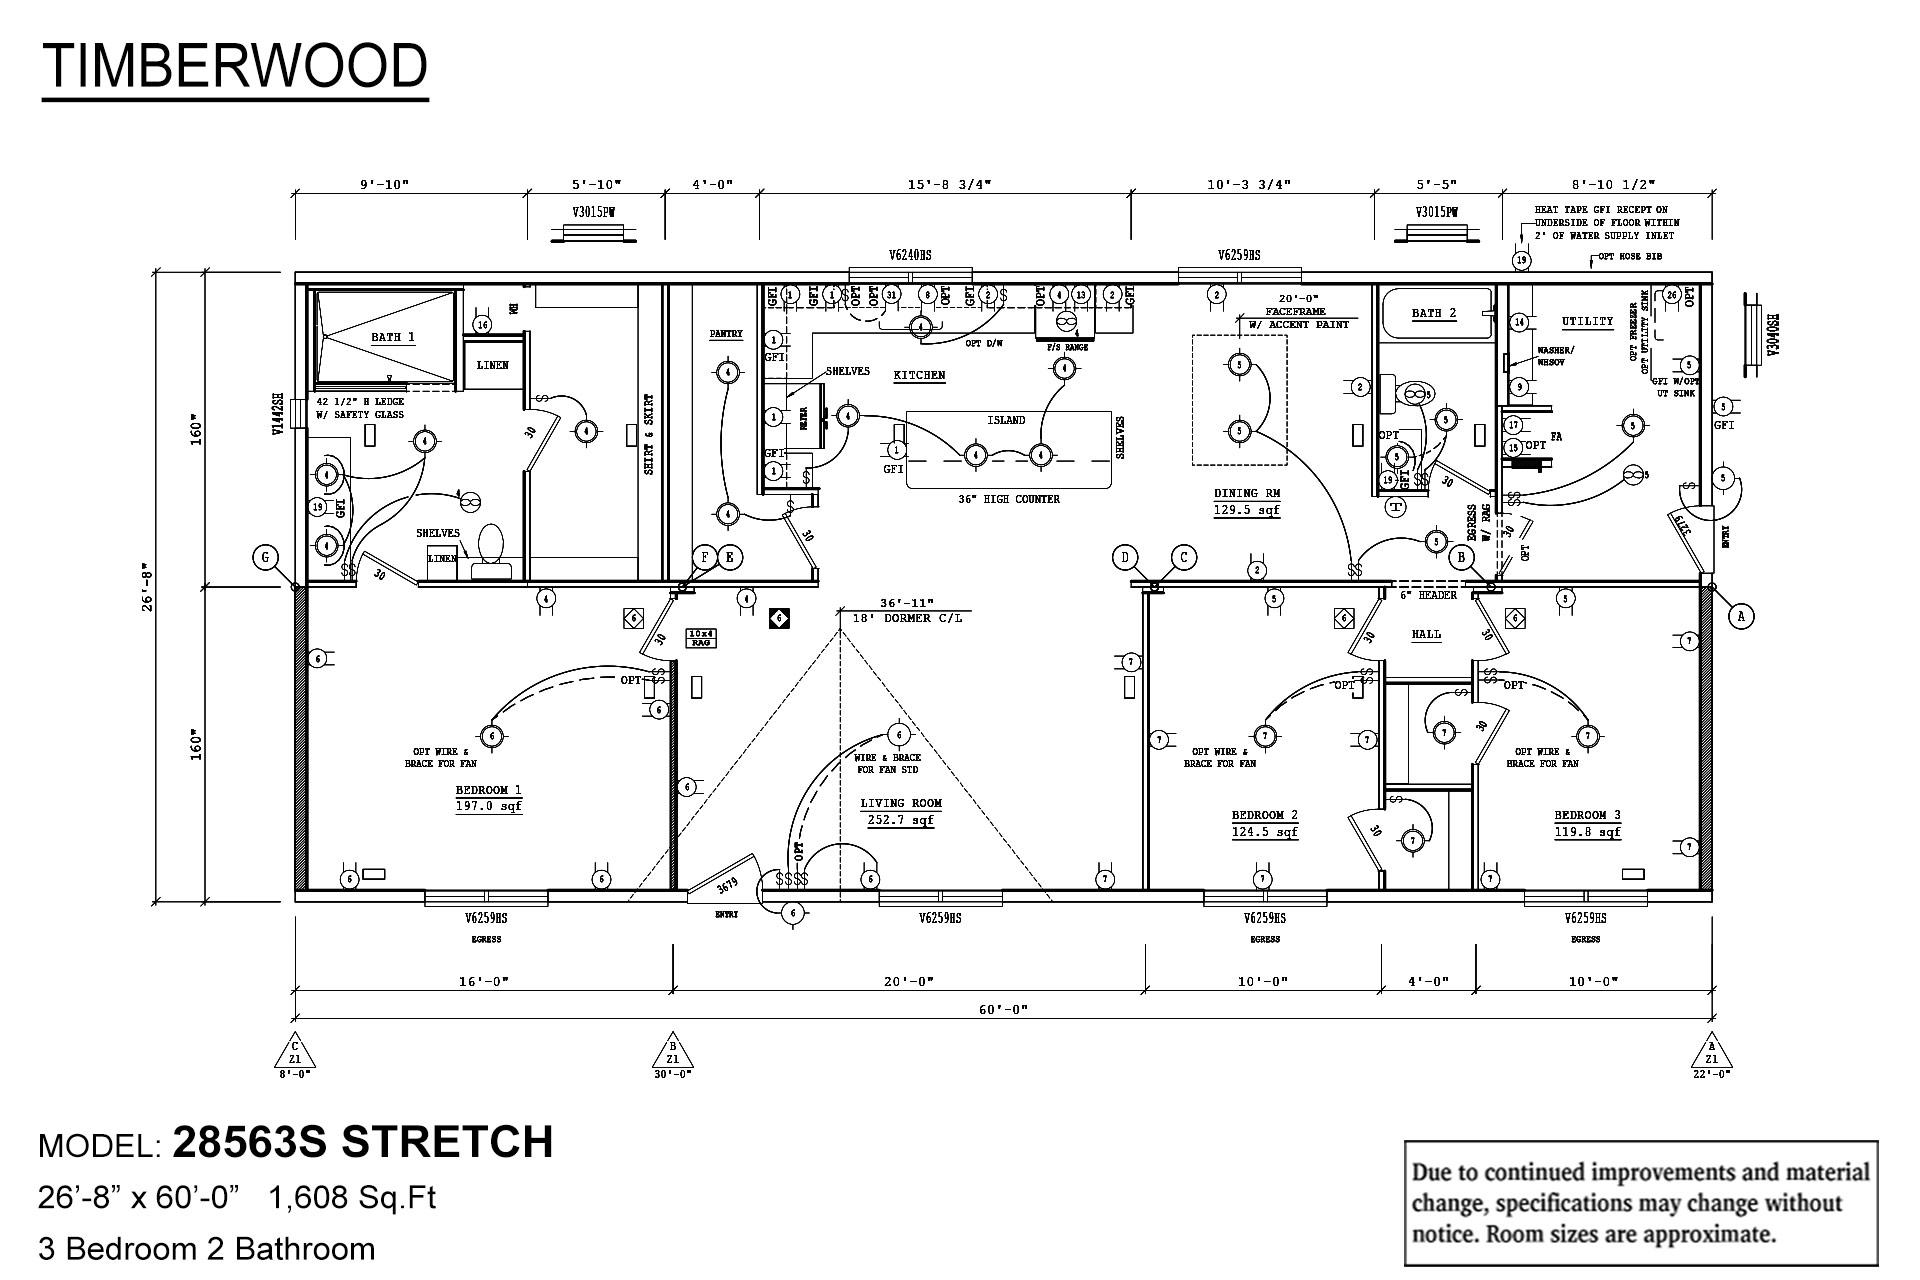 Timberwood 28563S Stretch Layout